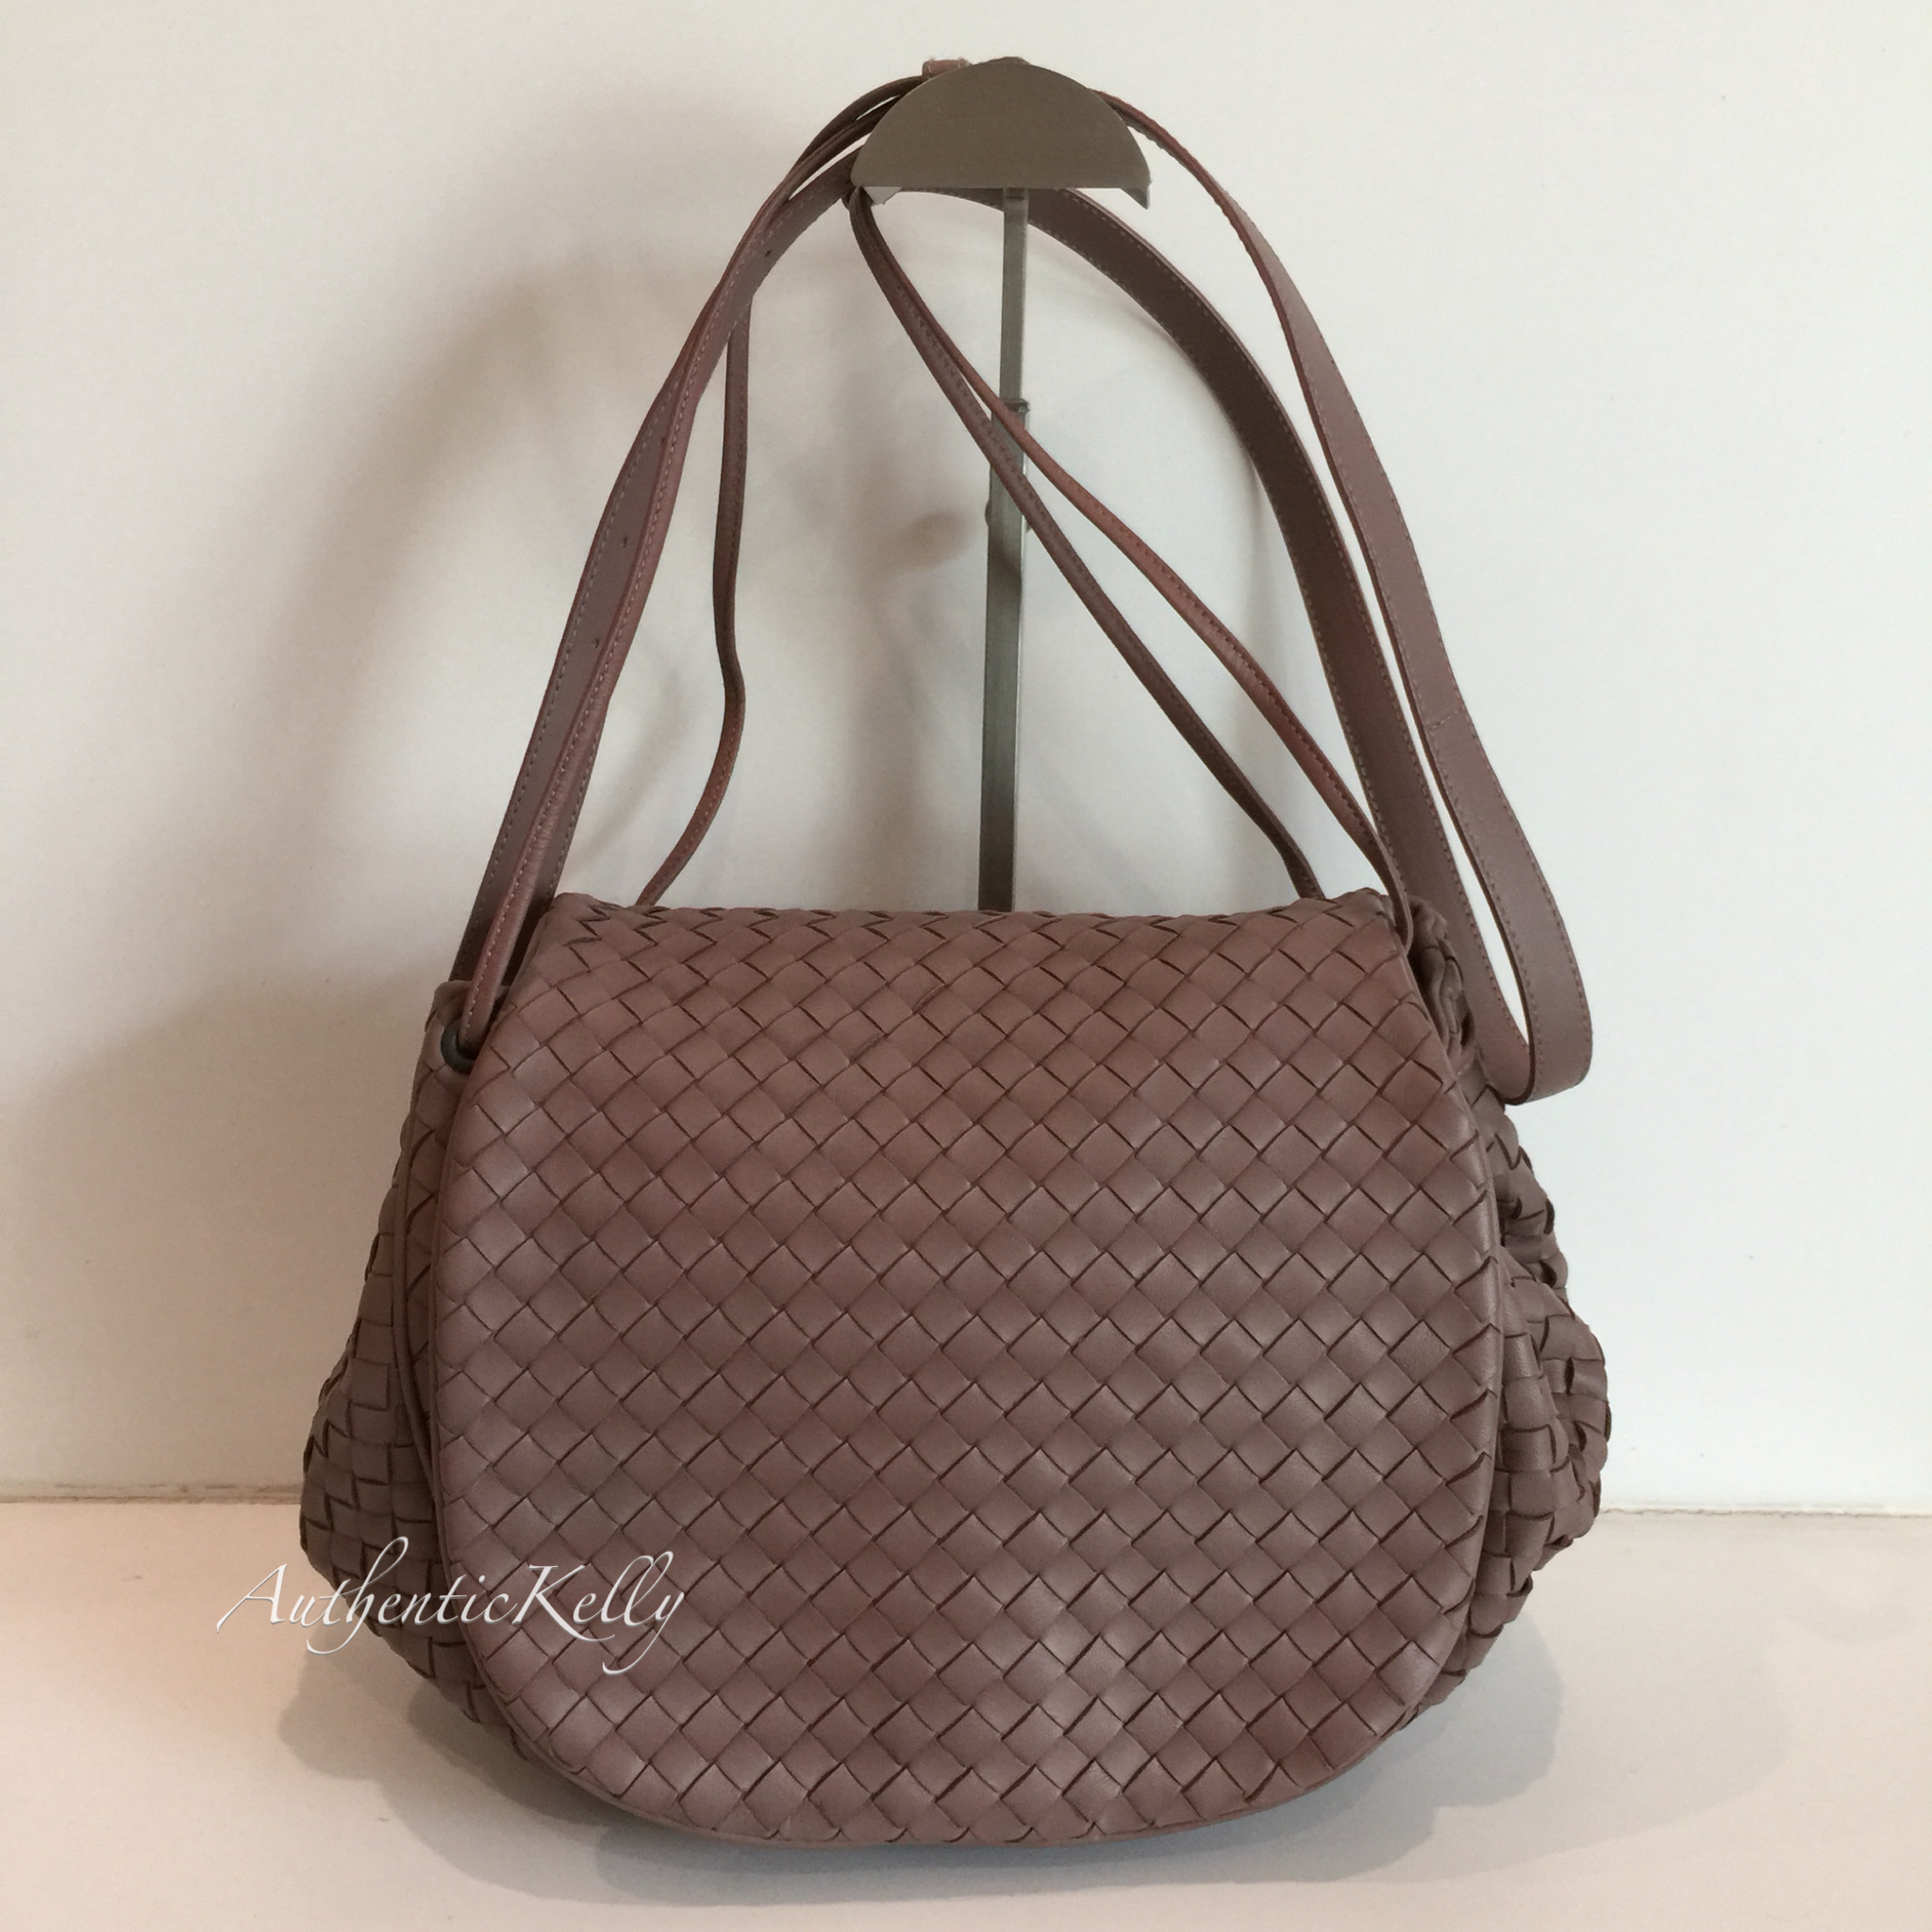 BOTTEGA VENETA Flap Messenger Bag Intrecciato Nappa Medium – AuthenticKelly 67ccf6330eca0